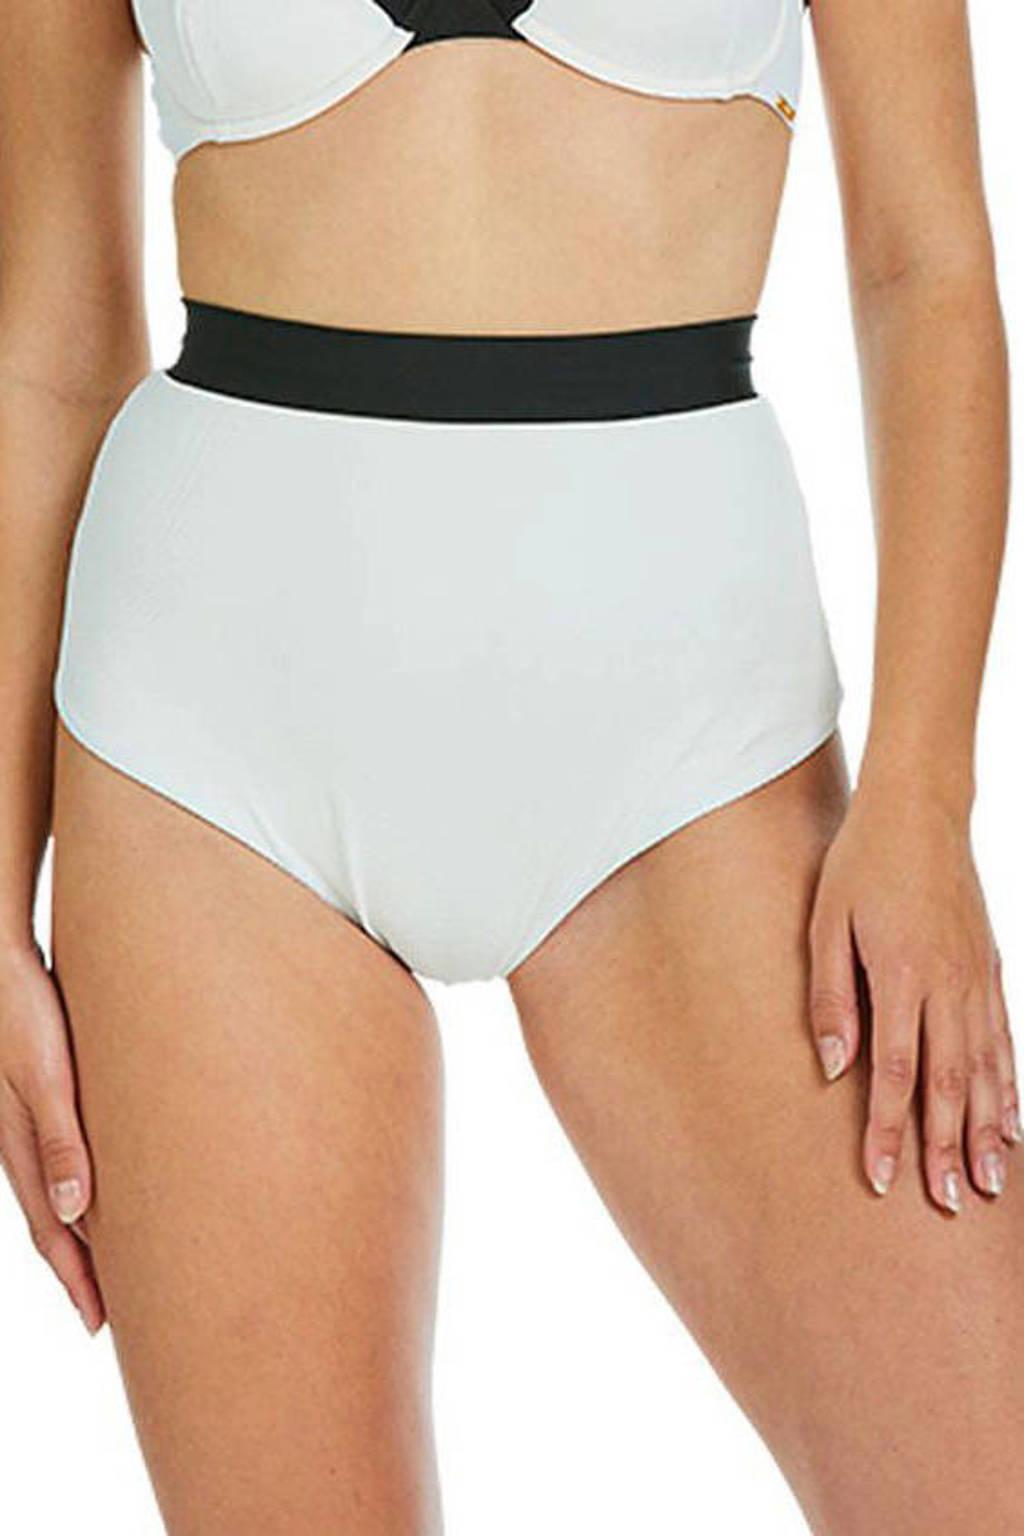 Sapph high waist bikinibroekje Eva wit/zwart, Wit/zwart